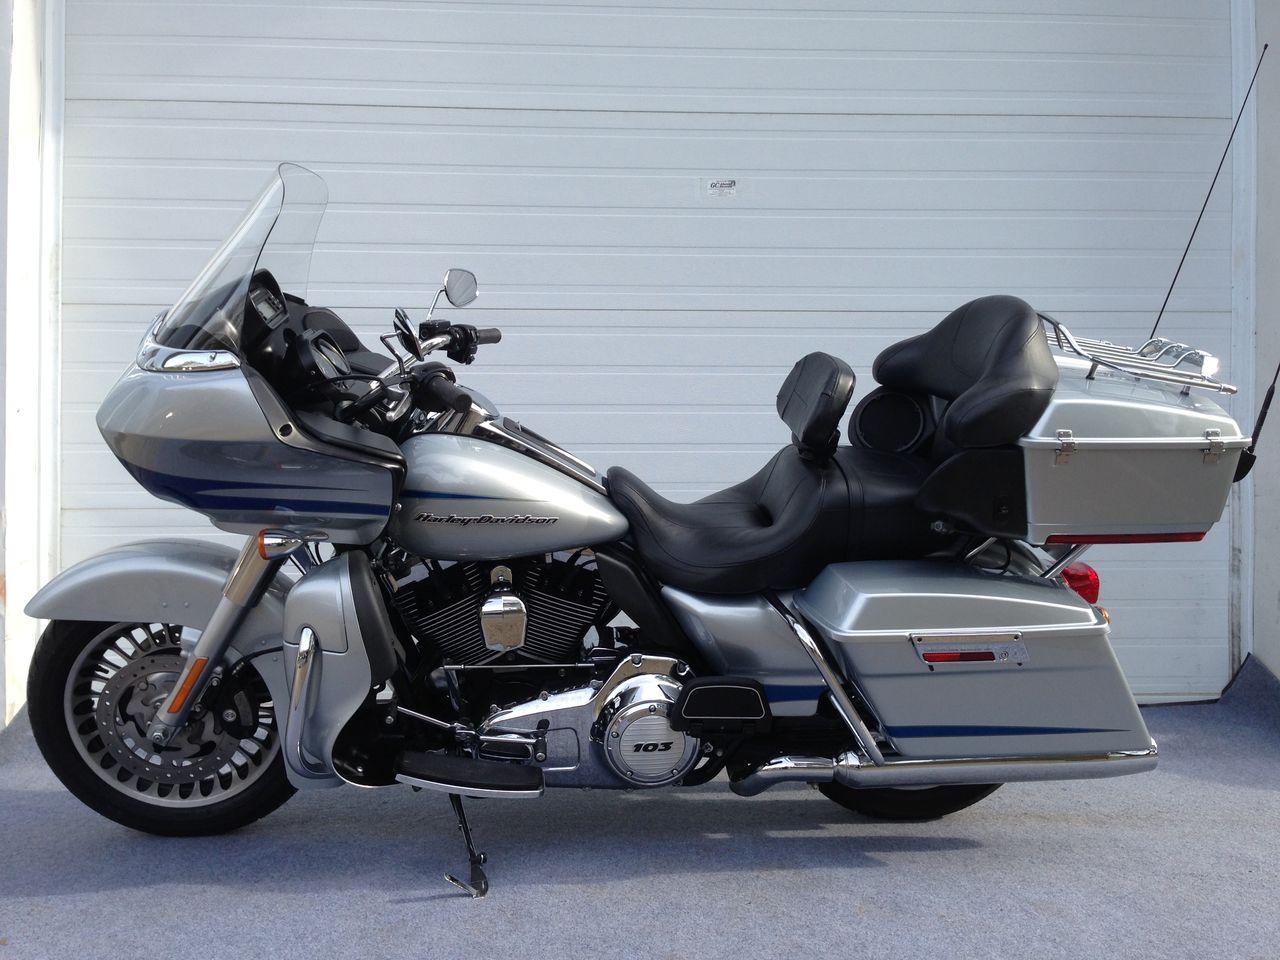 2011 Harley FLTRU